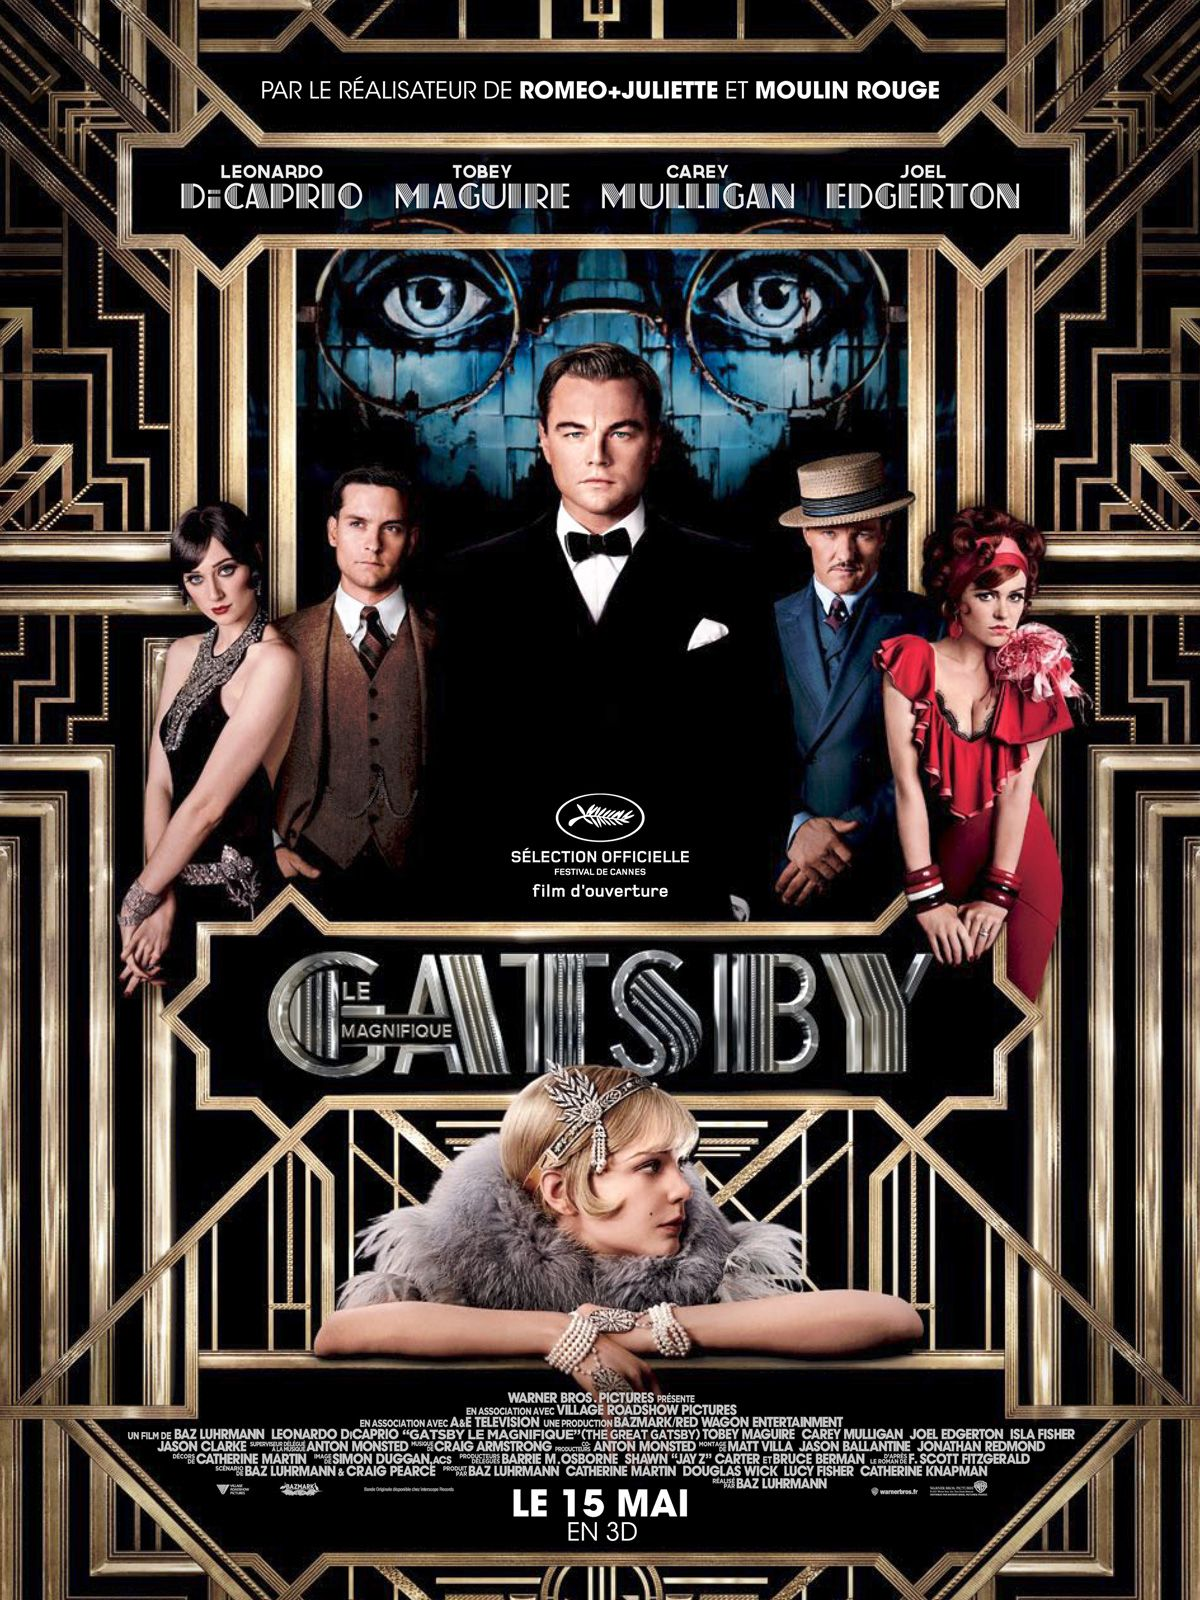 Gatsby Le Magnifique Mai 2013 Gatsby Gatsby Le Magnifique Film